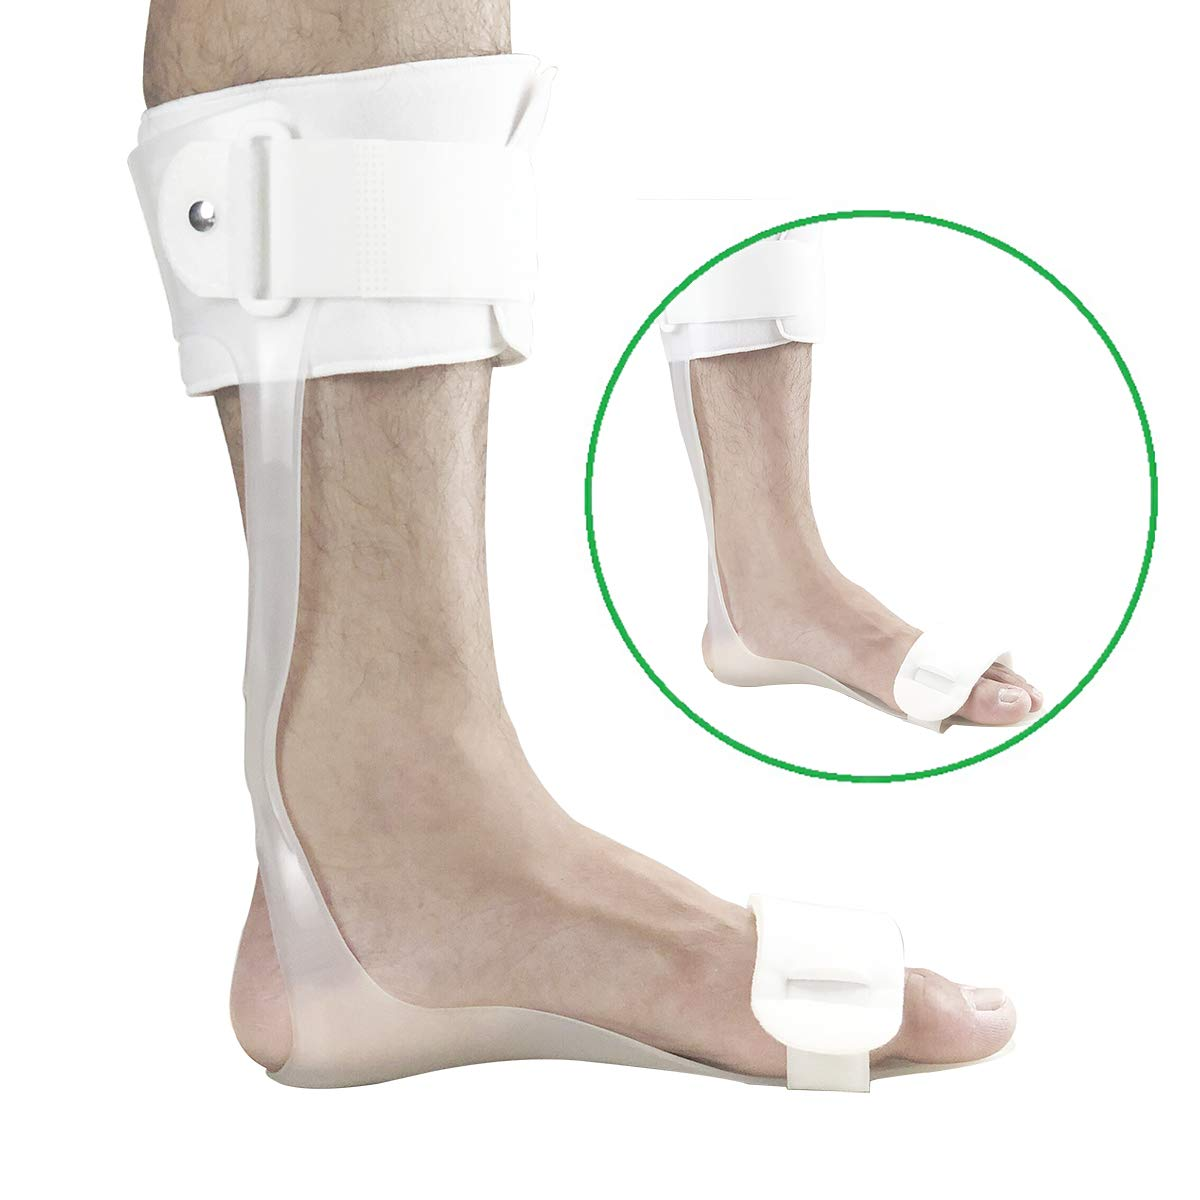 Orthomen Drop Foot Brace - AFO Leaf Spring Splint (M-Right) by Orthomen